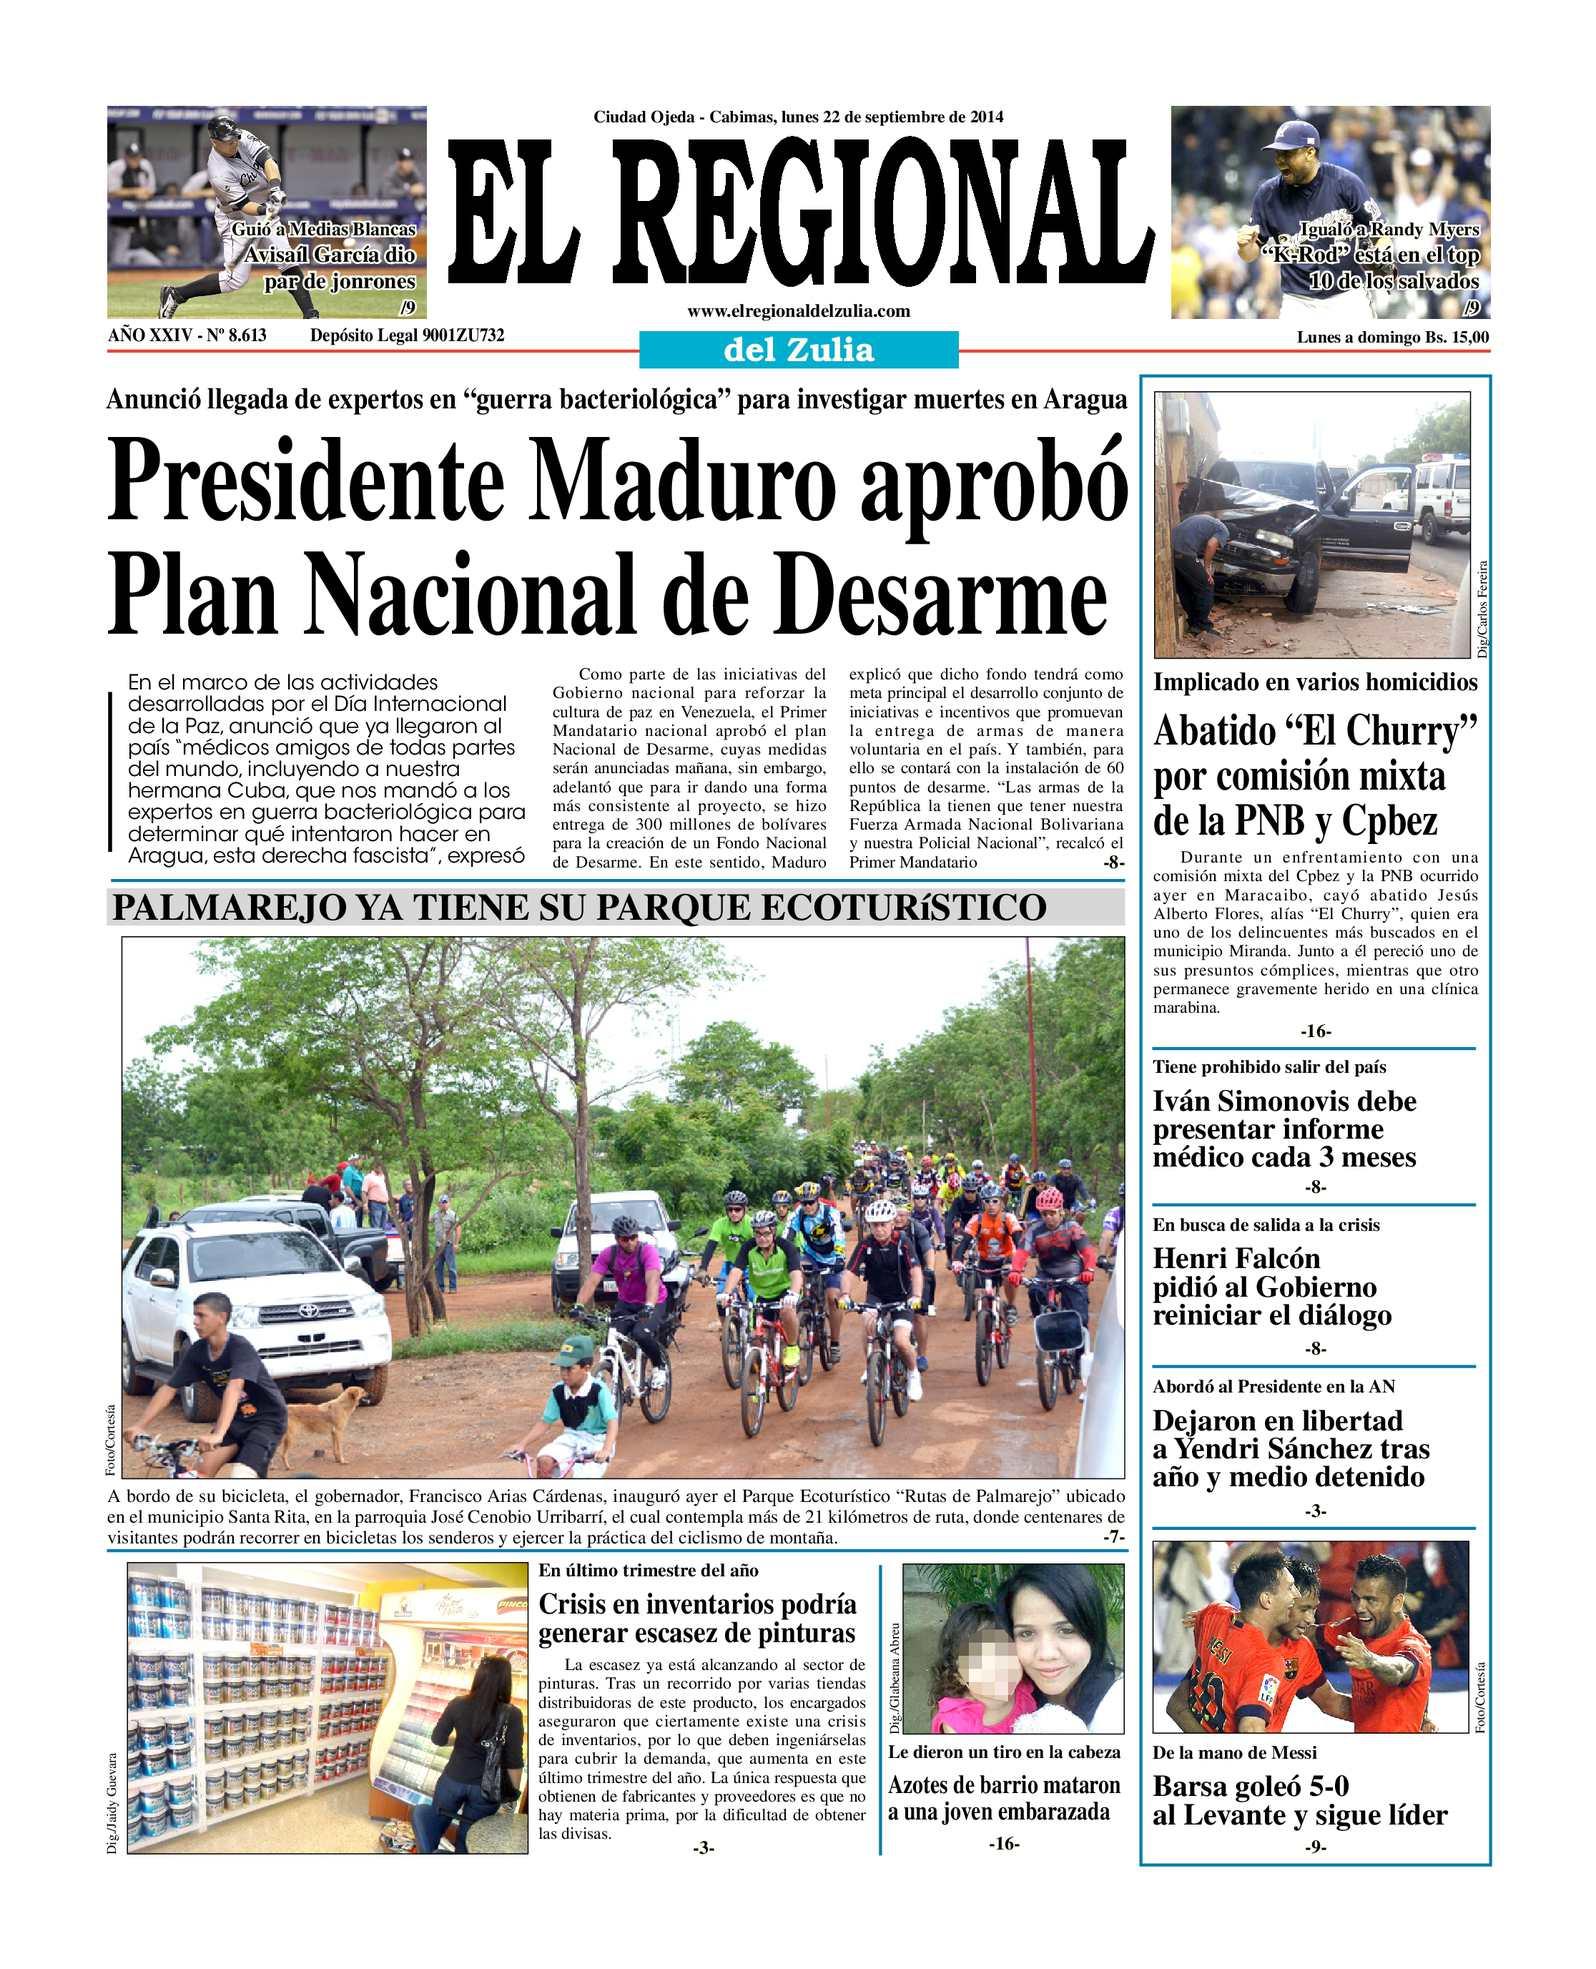 Calaméo - El Regional del Zulia 22-09-2014